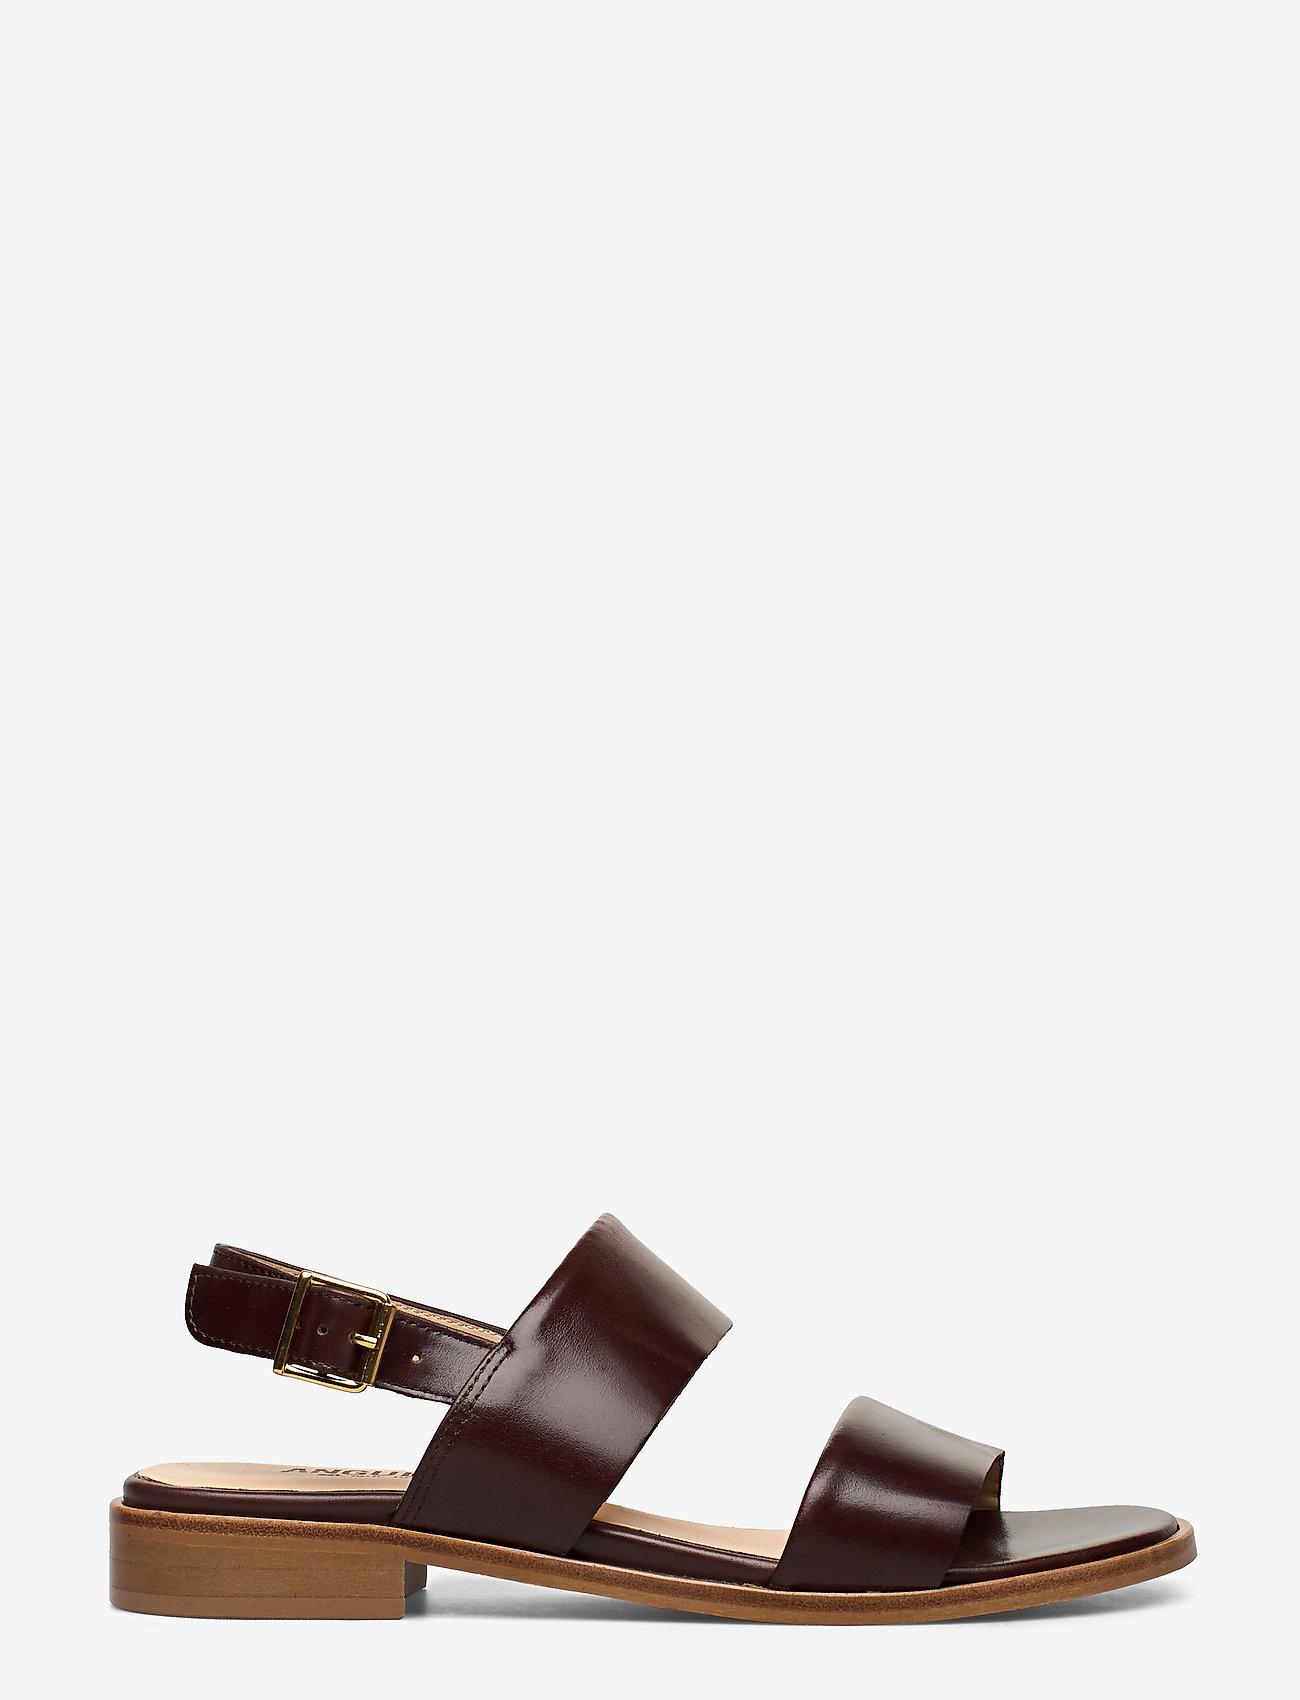 ANGULUS - Sandals - flat - platta sandaler - 1836 dark brown - 1